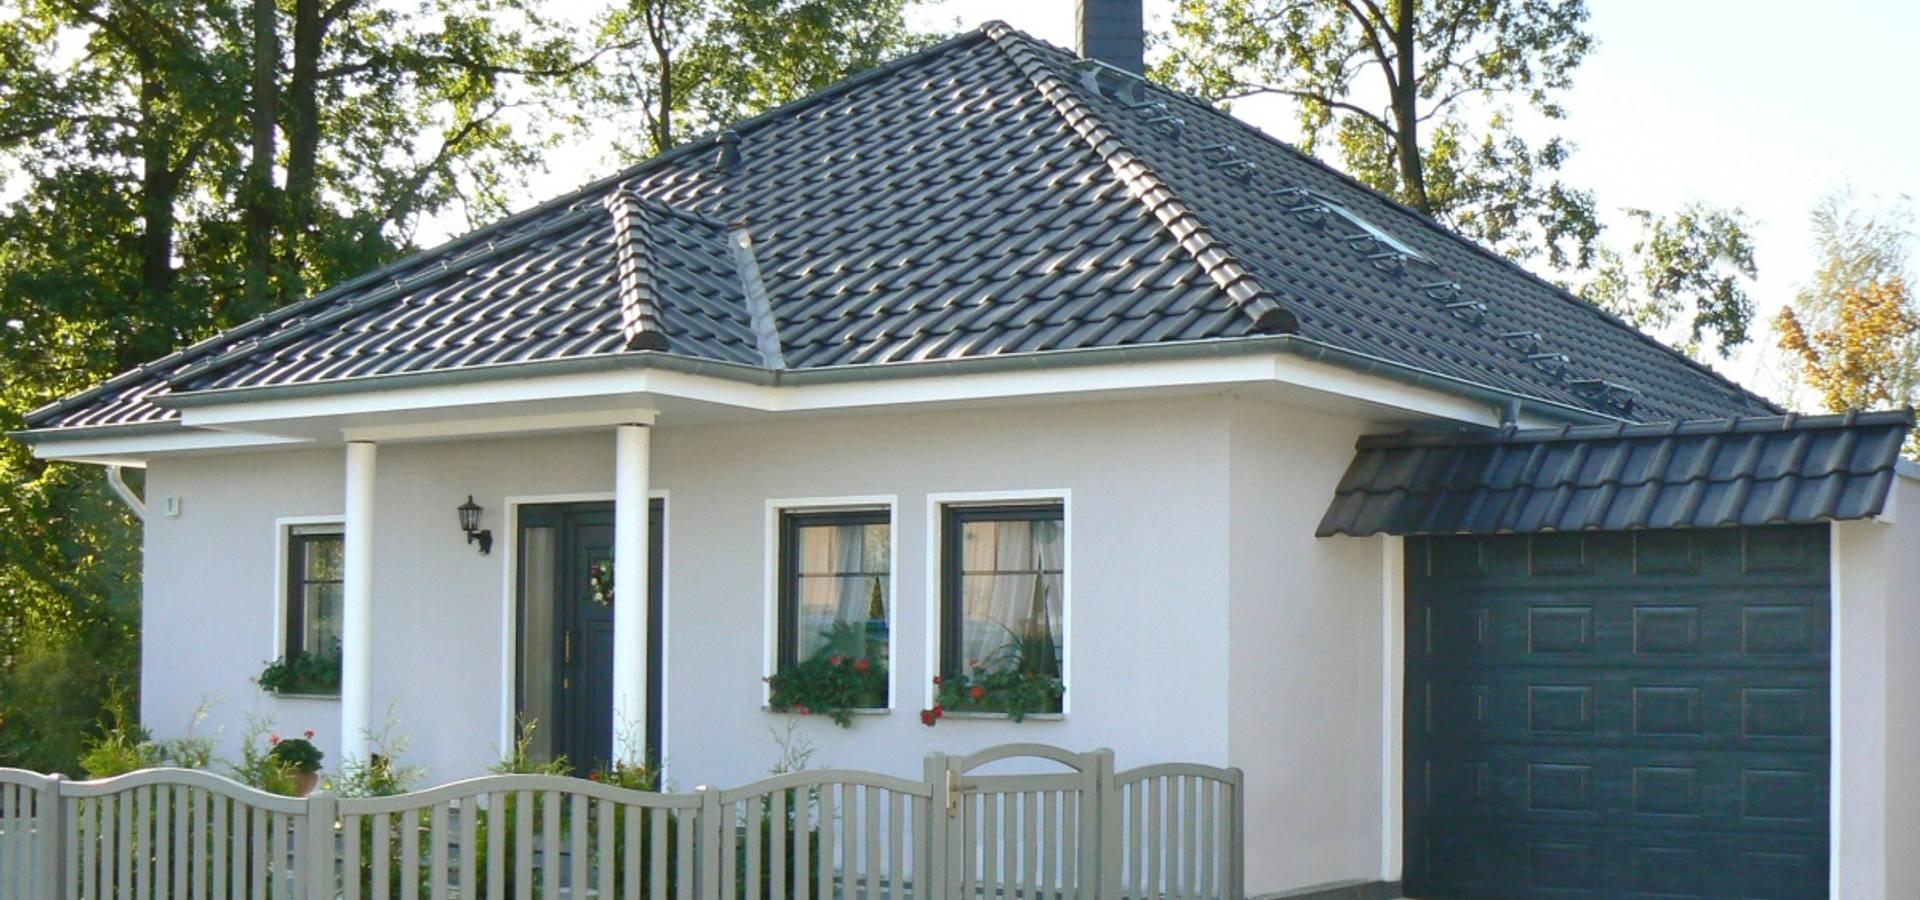 SMART Massivhaus—MAZ Bau GmbH